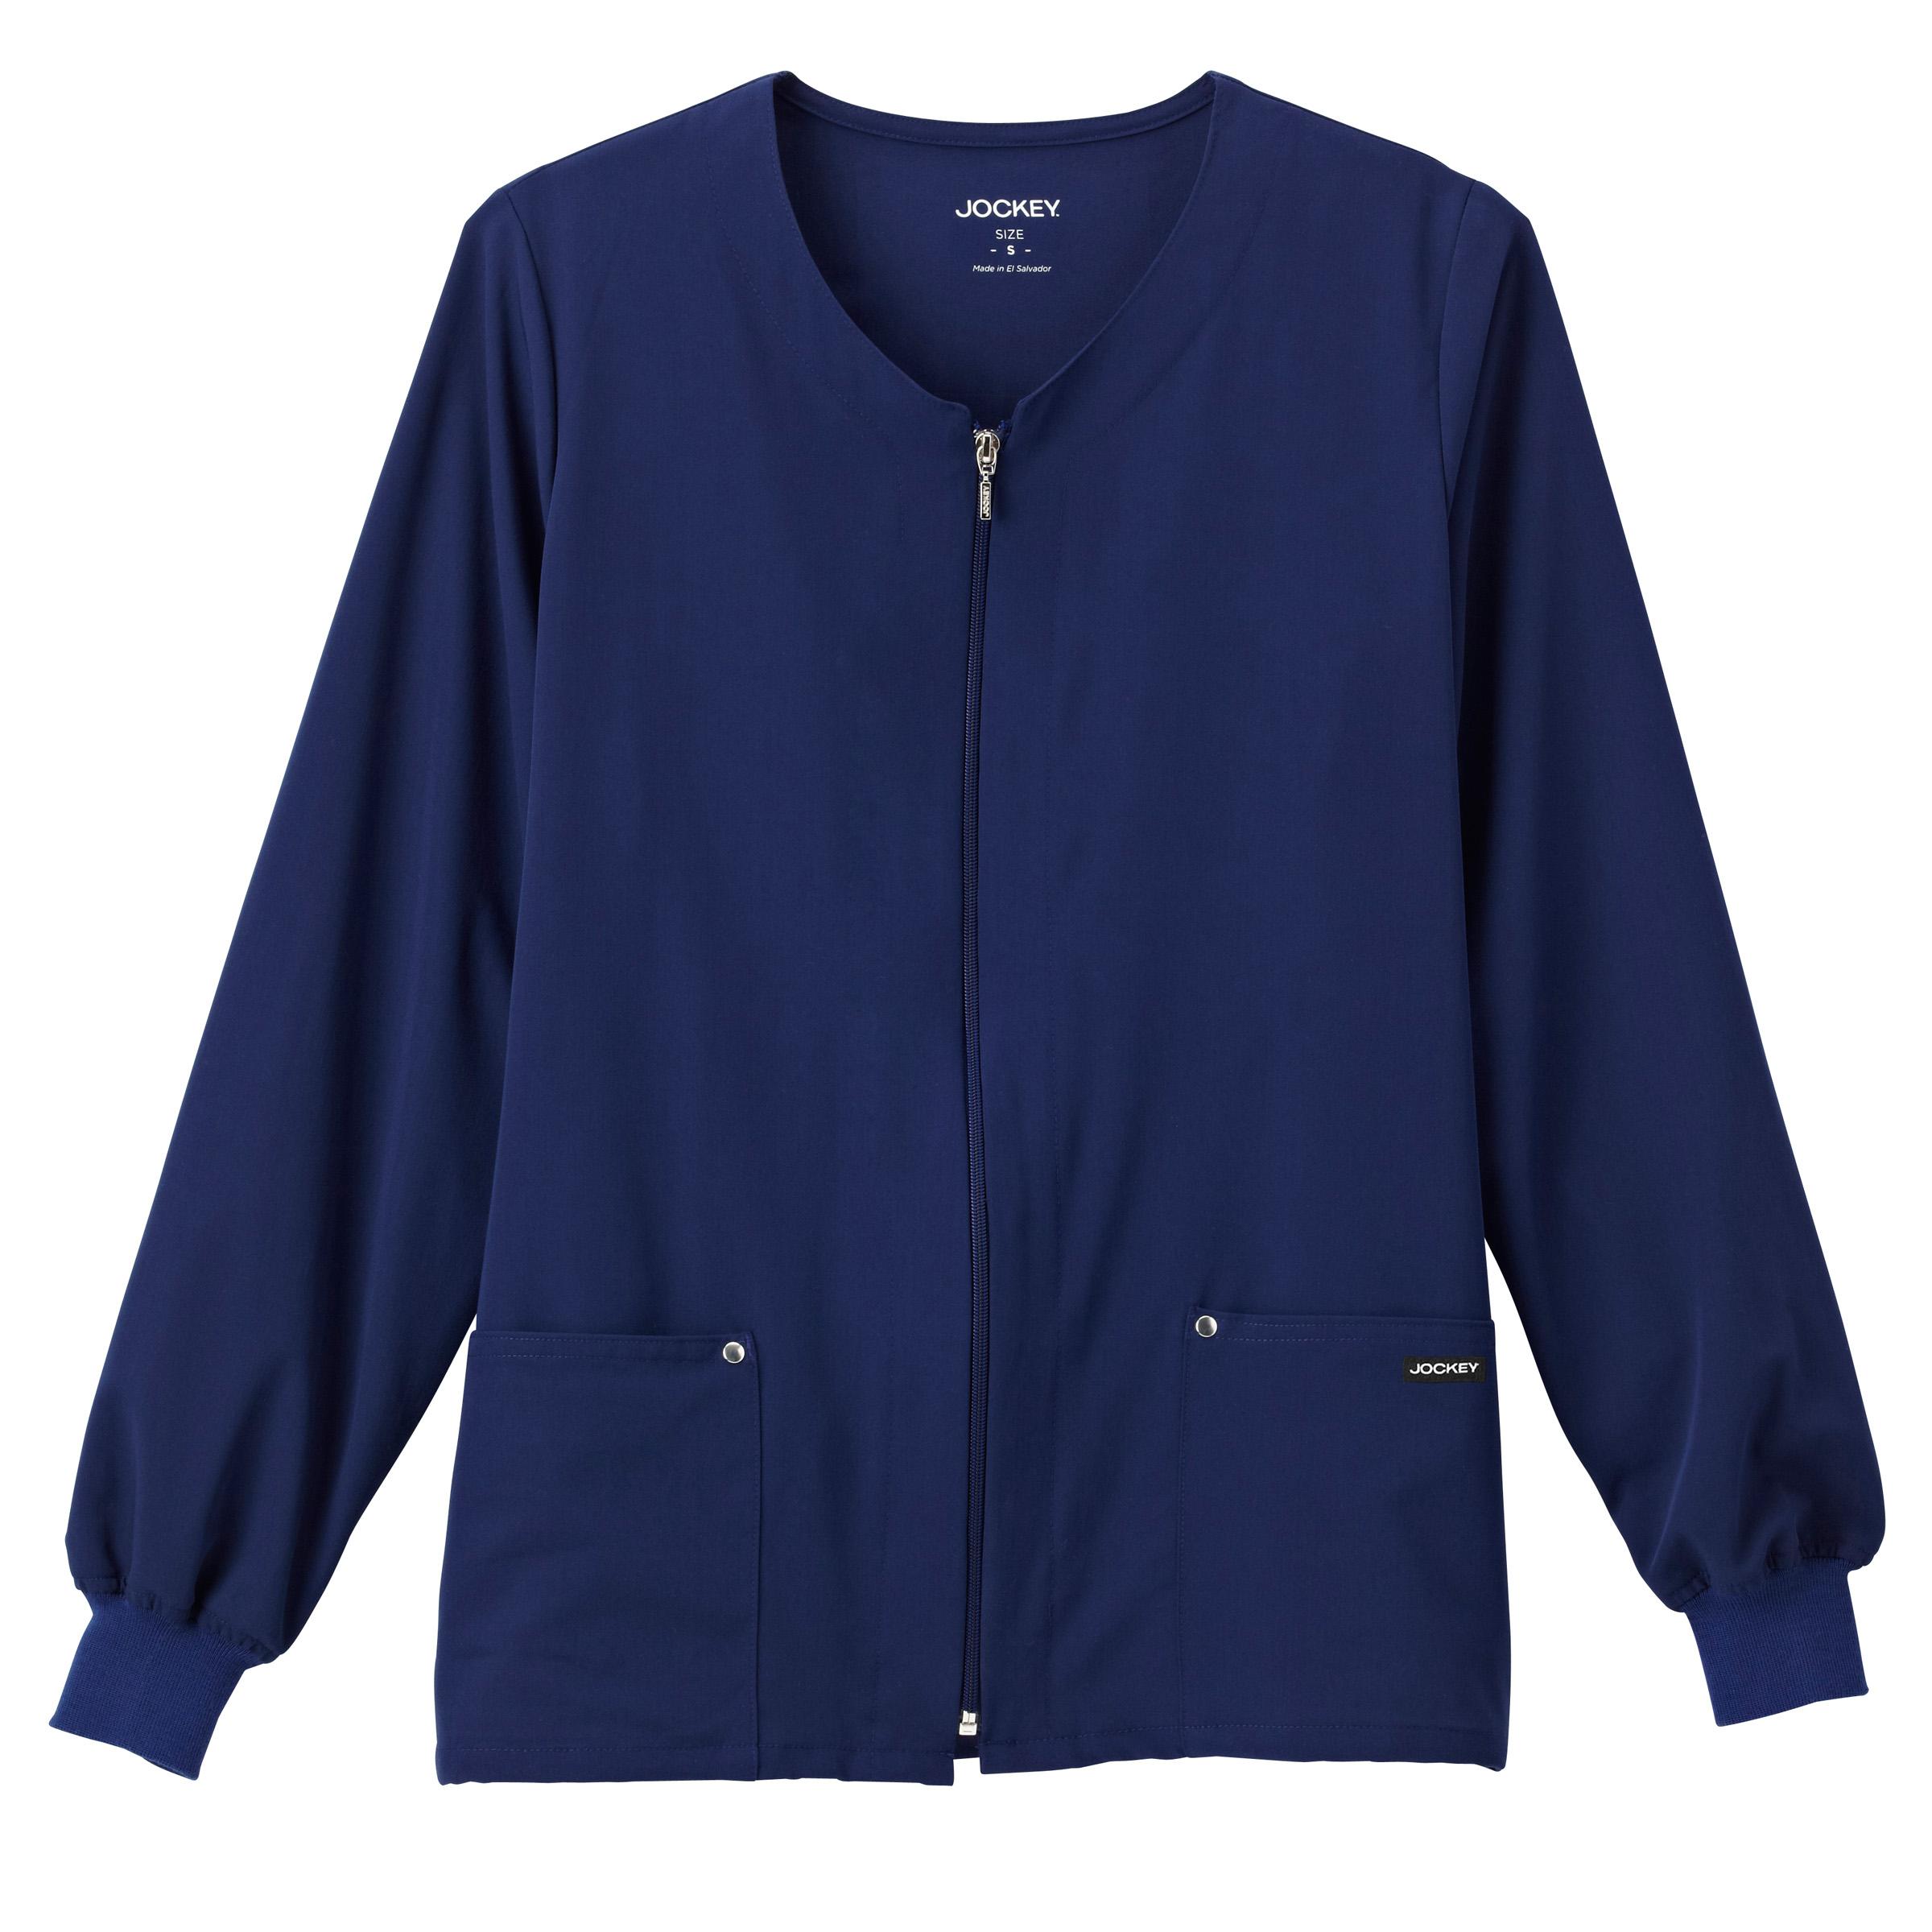 Jockey® Classic Ladies V-Neck Zip-Up Jacket 2378